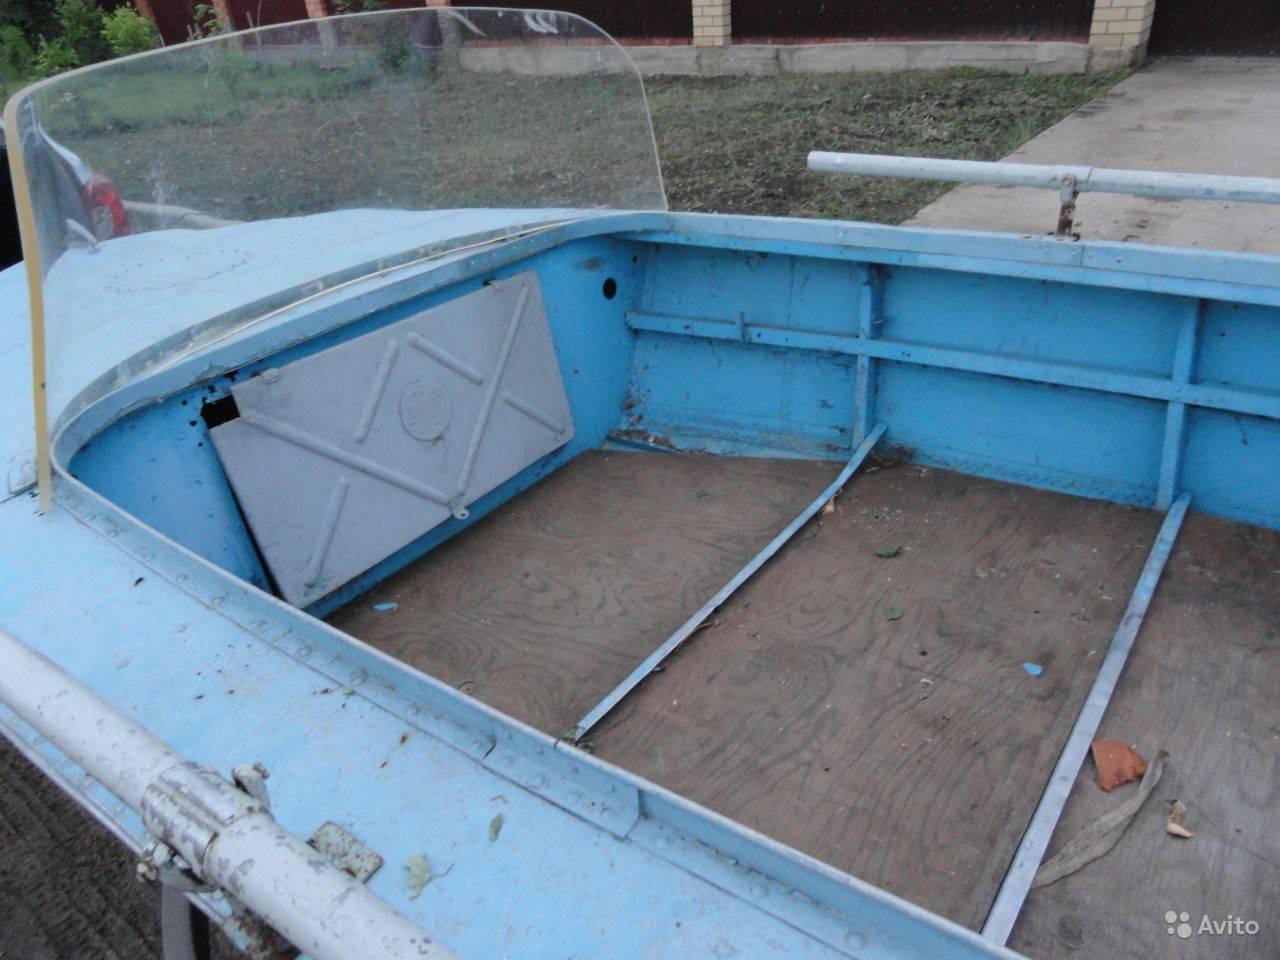 Лодка автобот: описание, технические характеристики, цена, отзывы